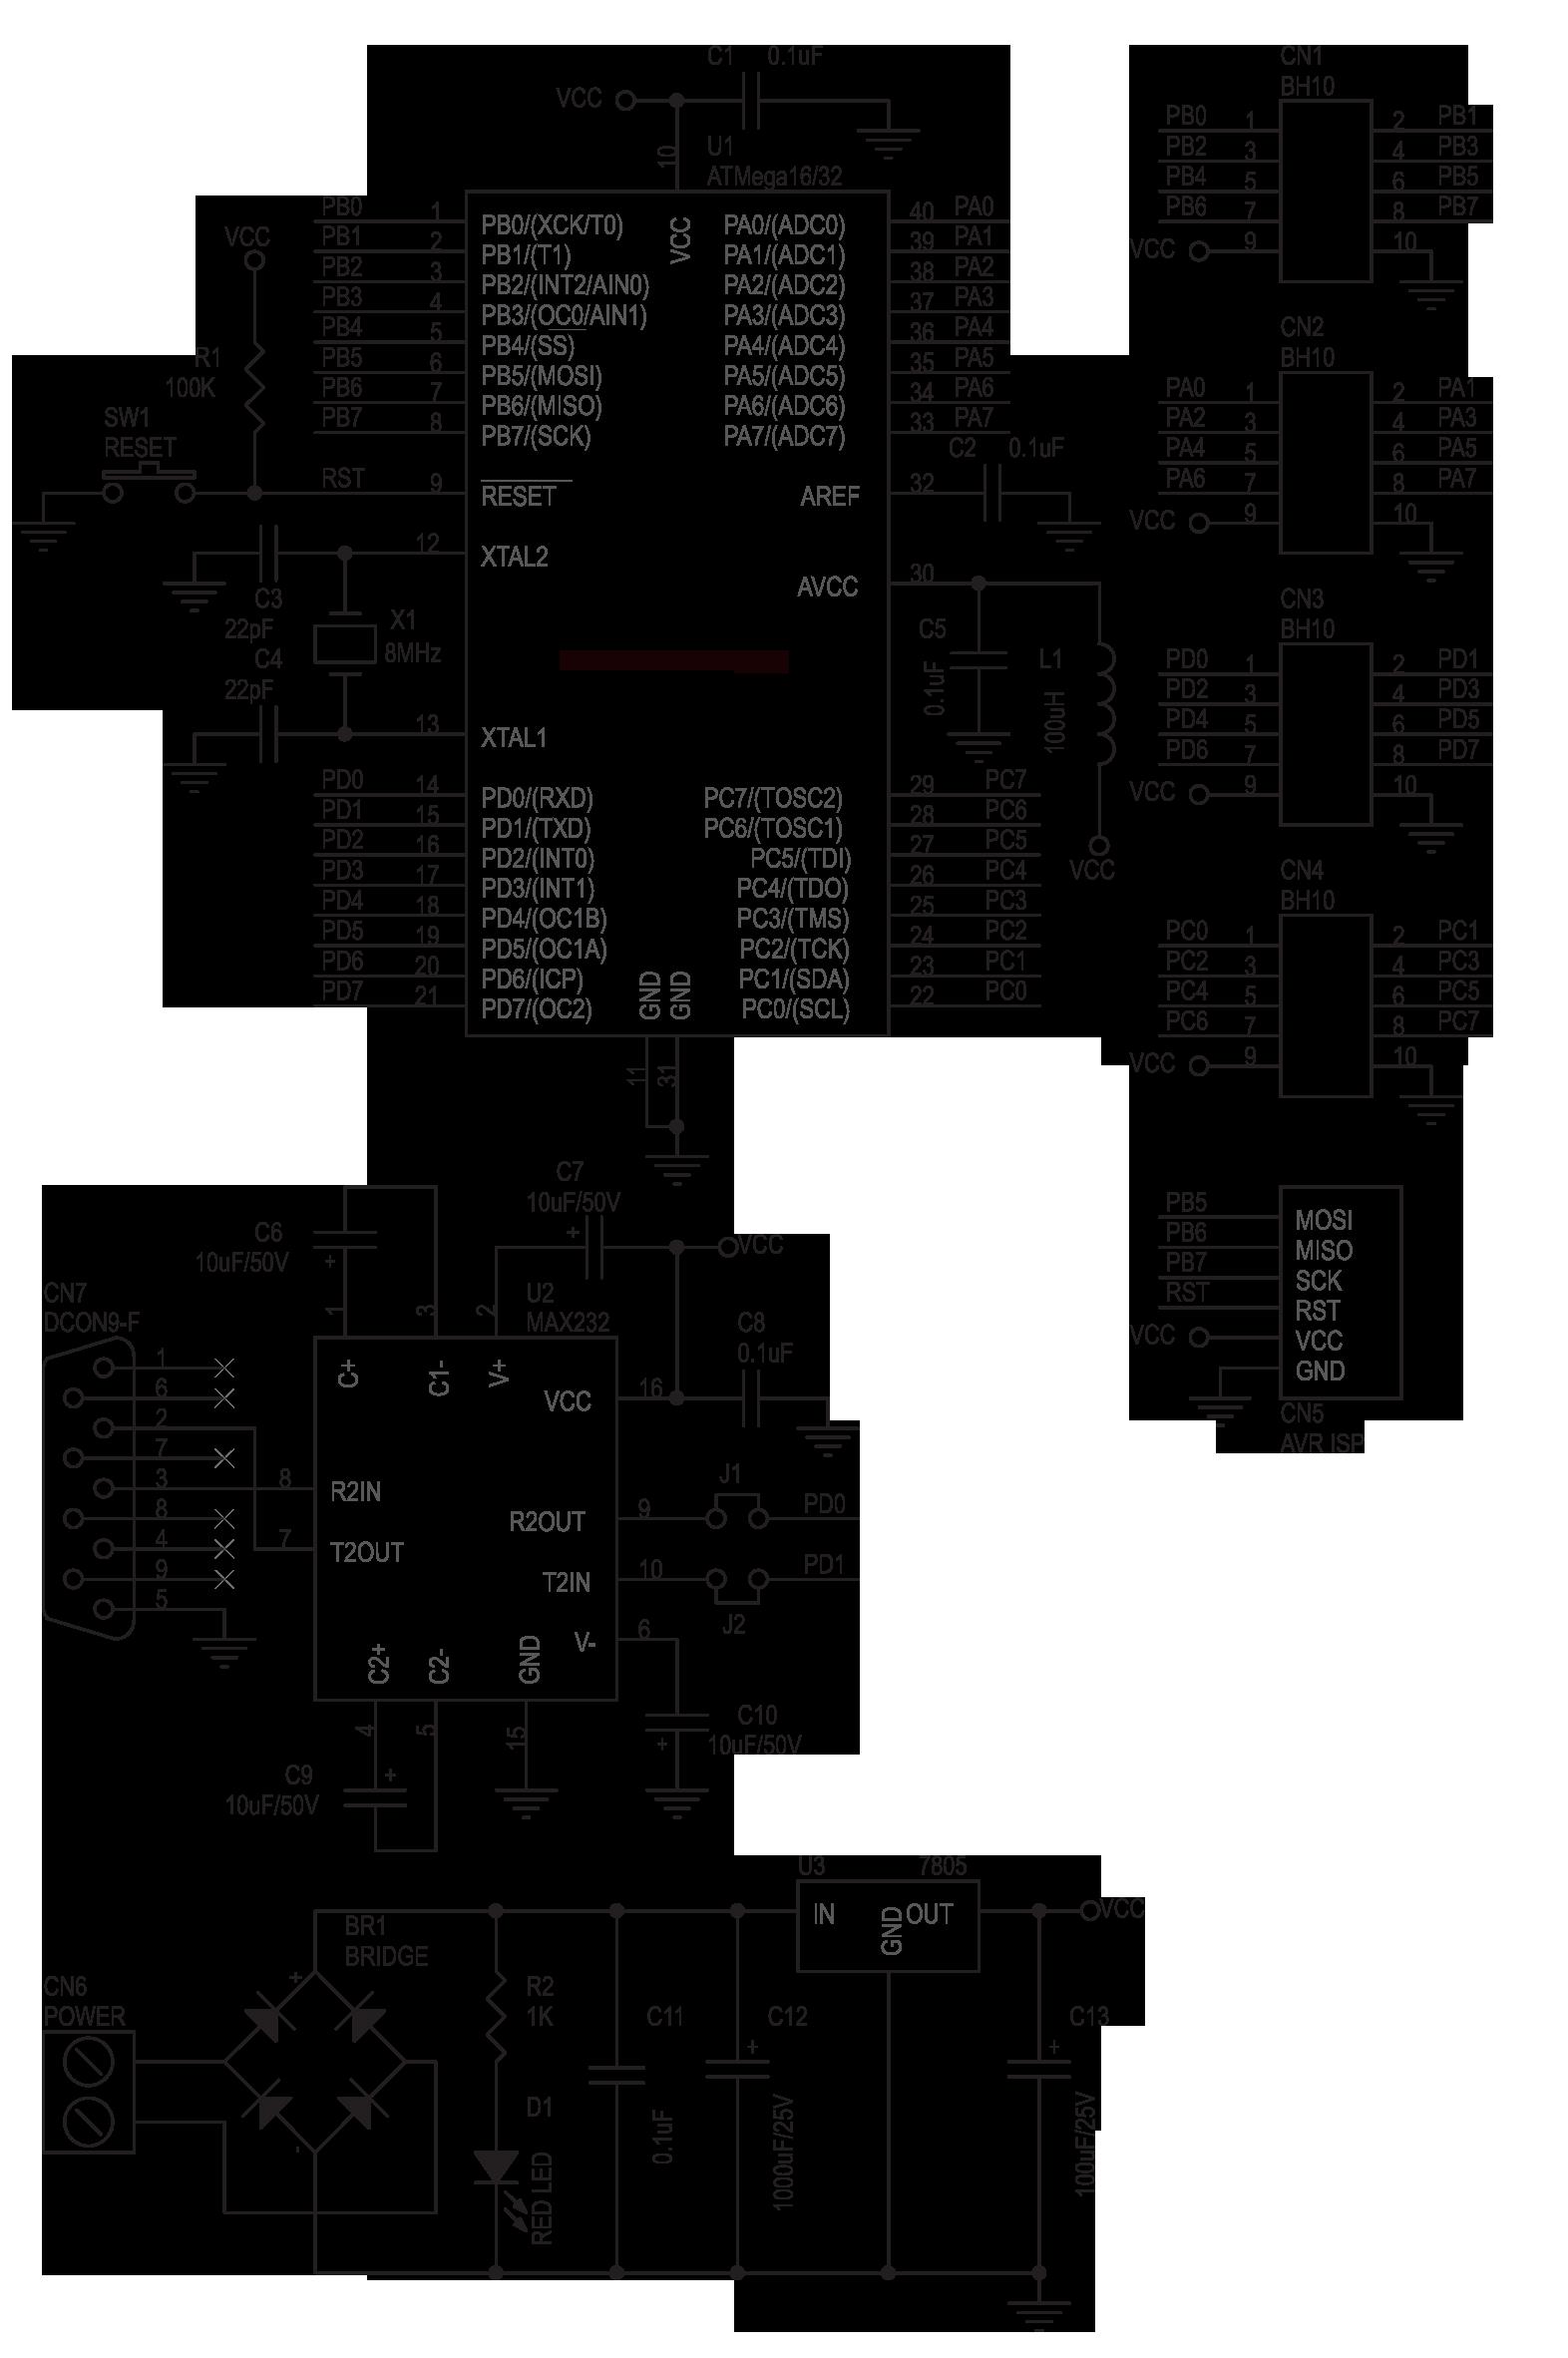 Atmega16 32 Development Board Electronics Lab Circuit Diagram Maker Electronicslab Schematic